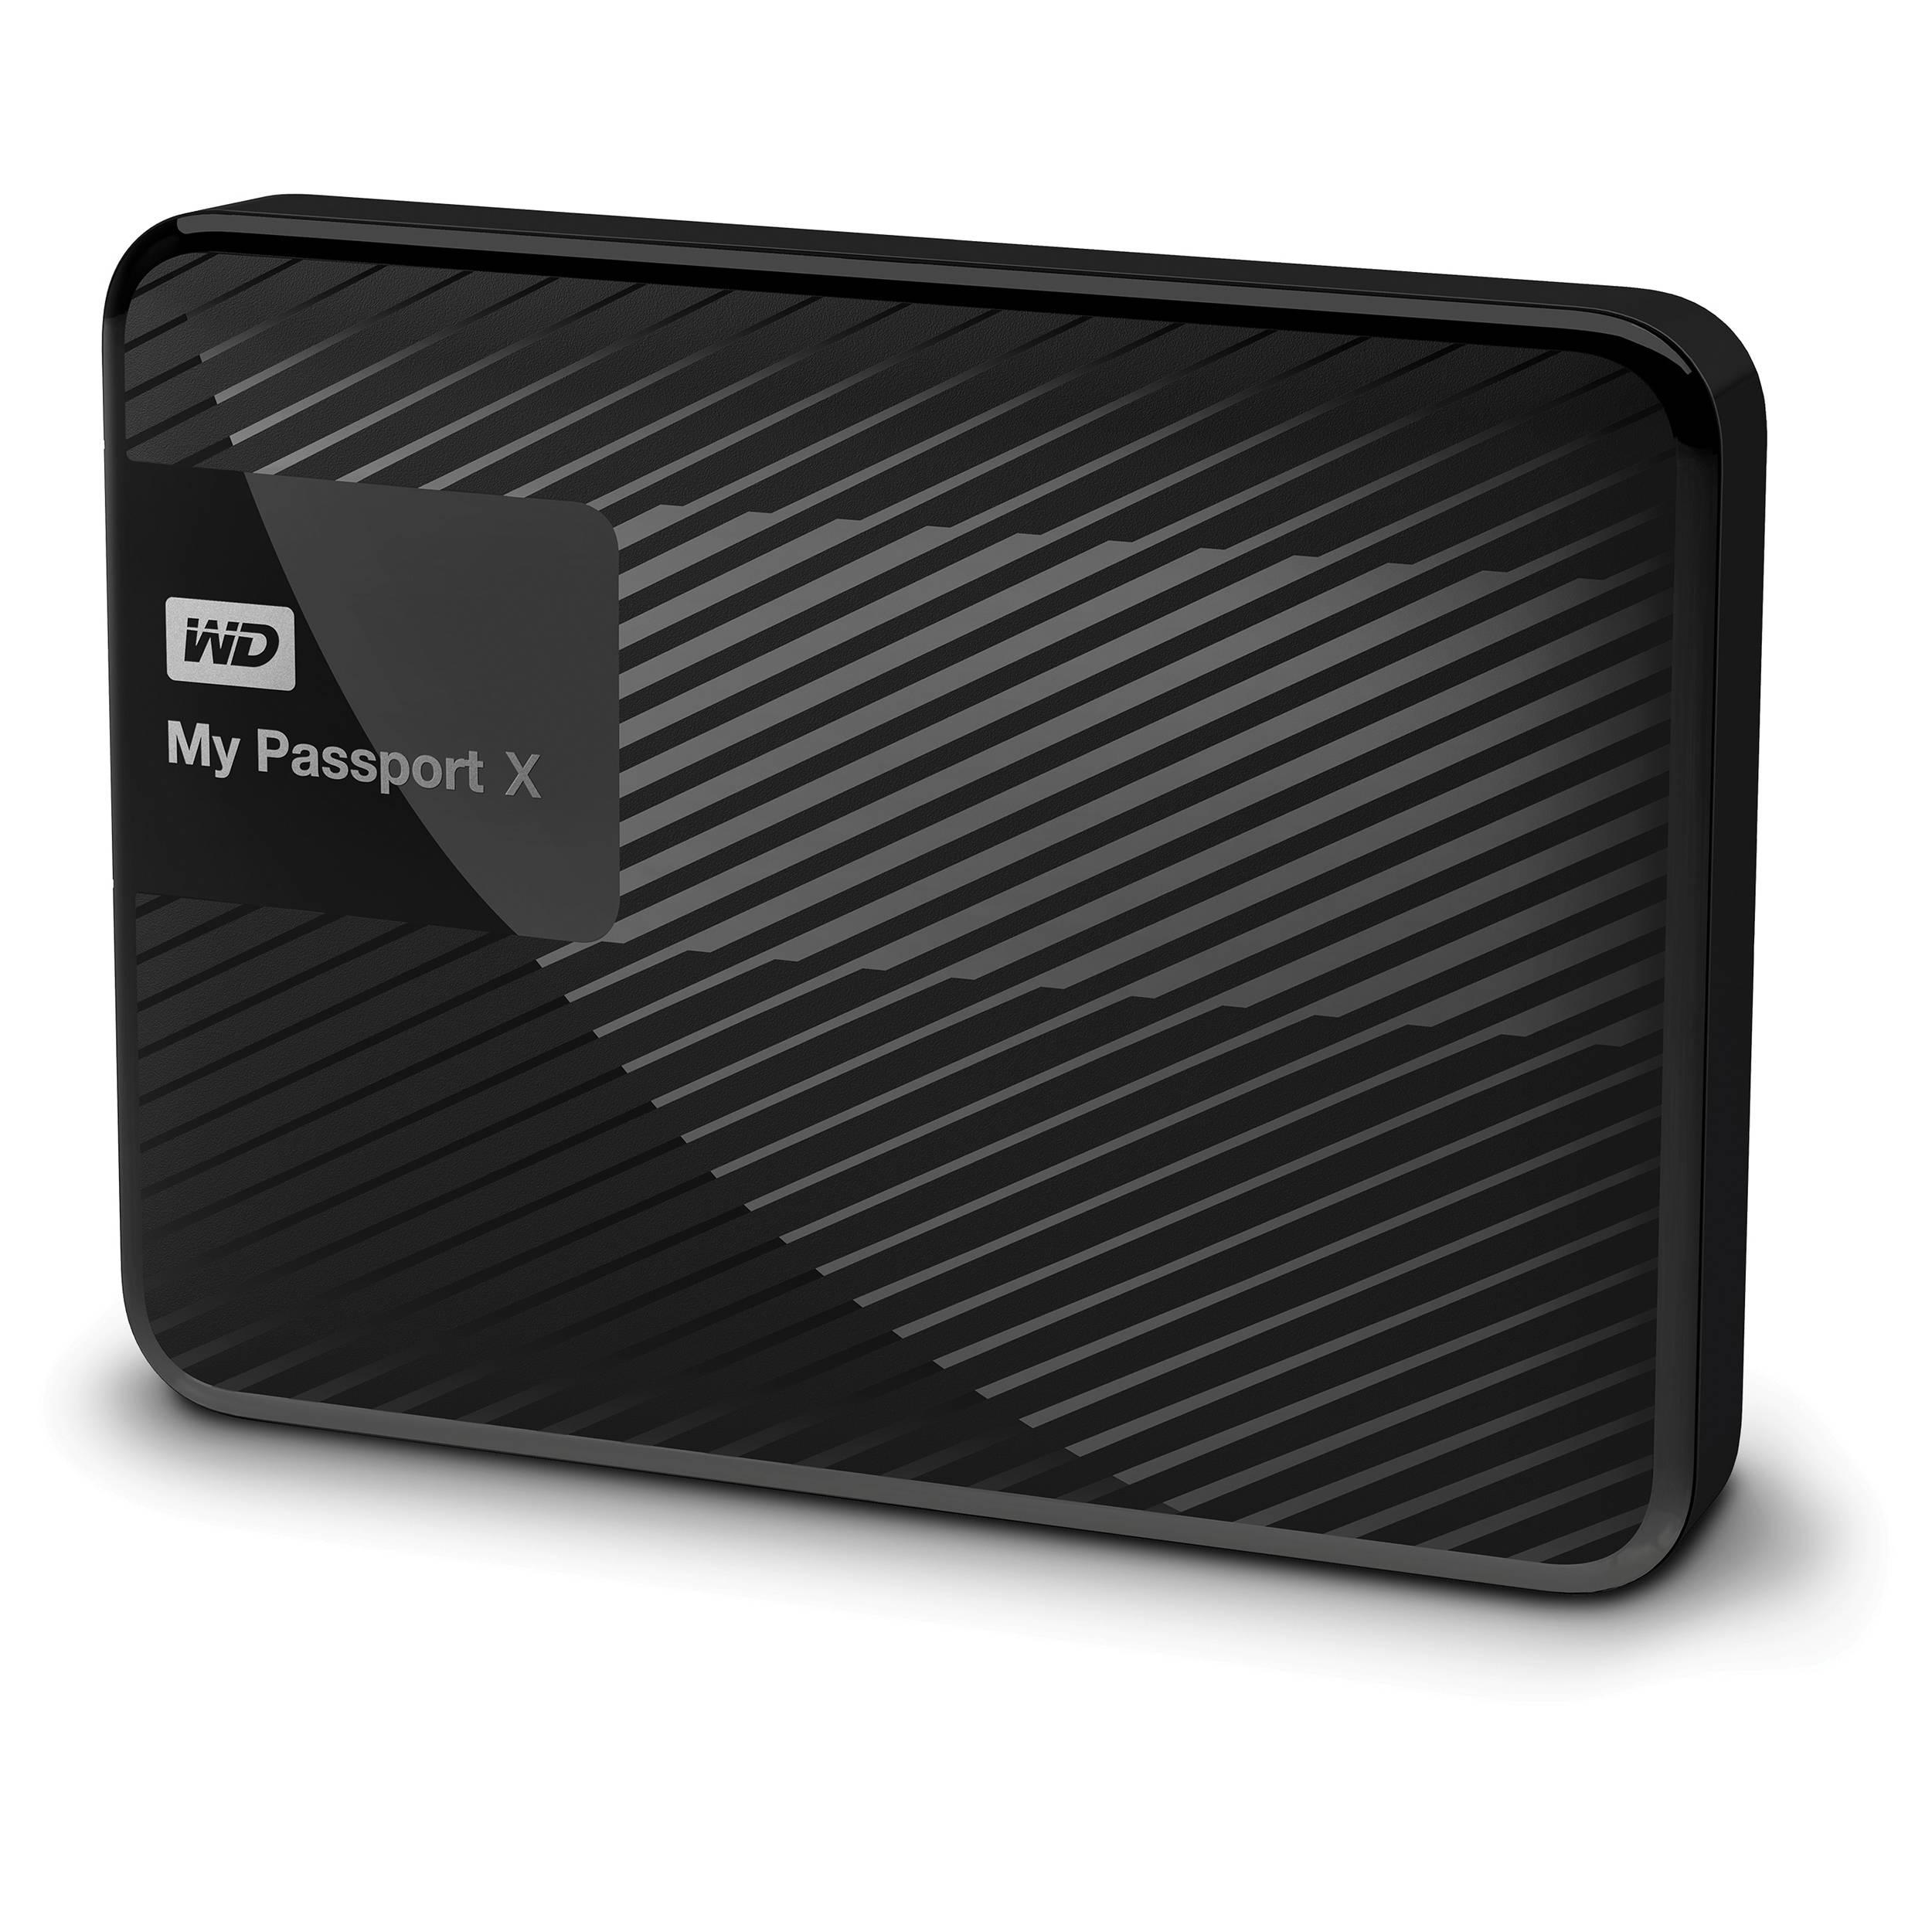 WD 2TB My Passport X USB 3.0 Hard Drive WDBCRM0020BBK-NESN B&H